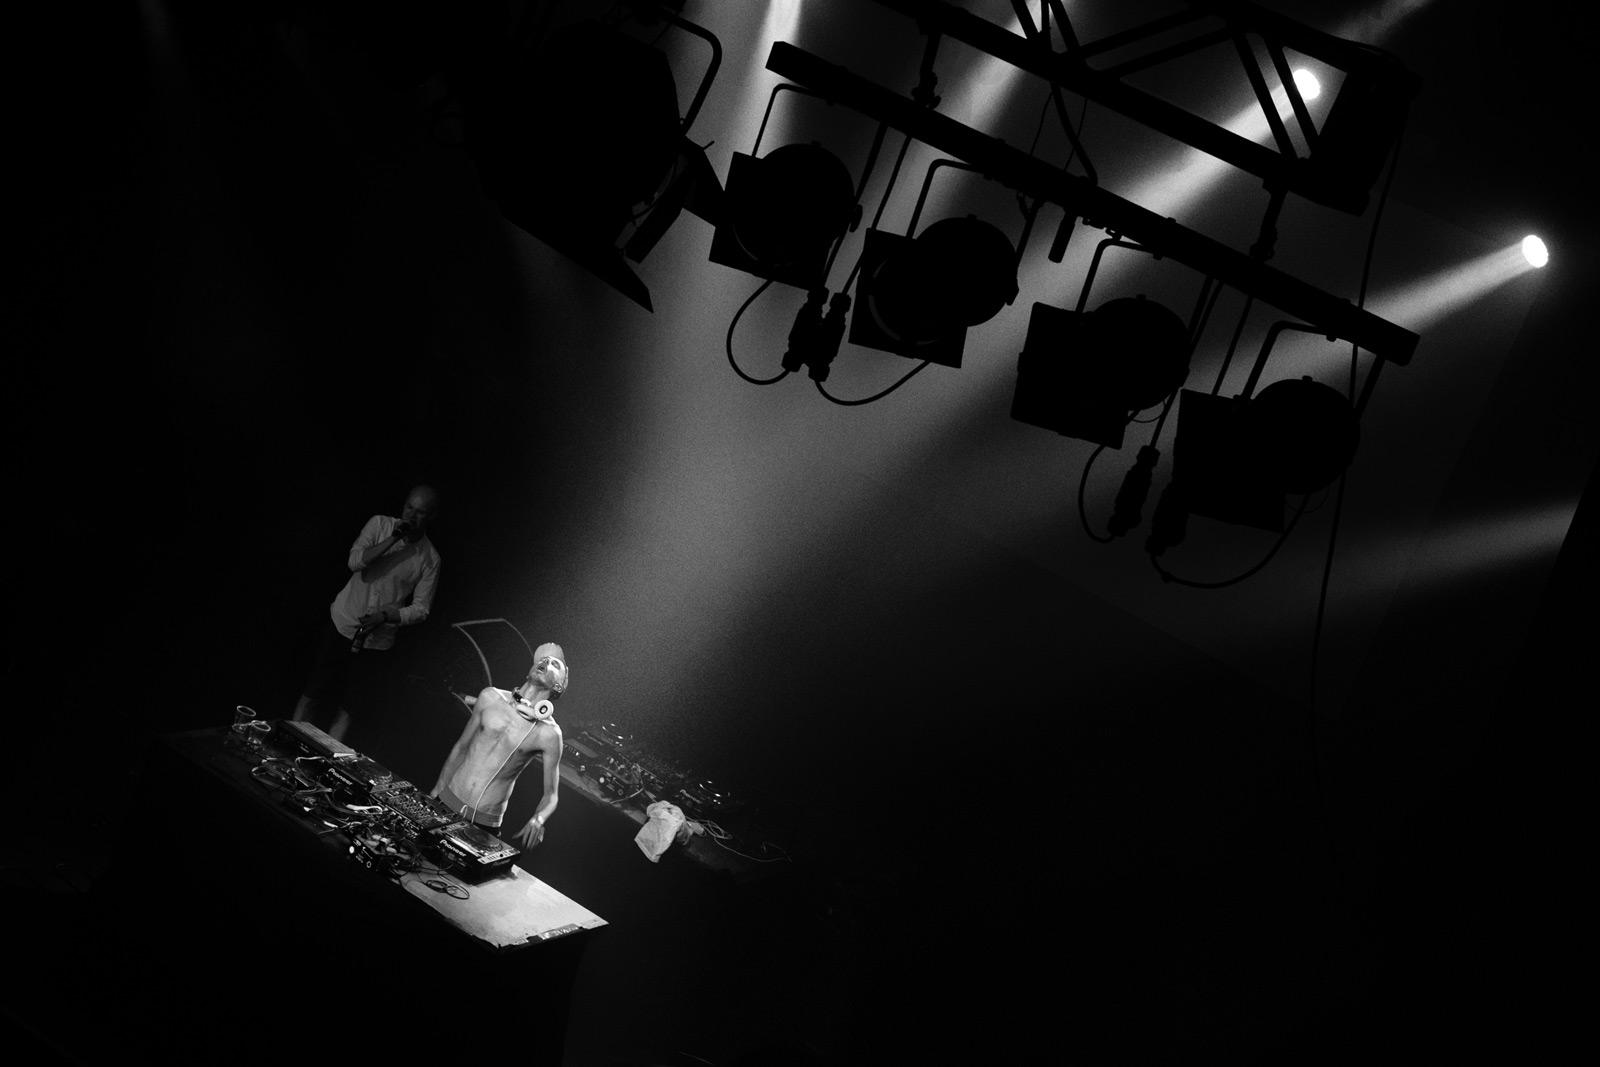 DJ Copyflex at Vega, Strøm festival 2012.